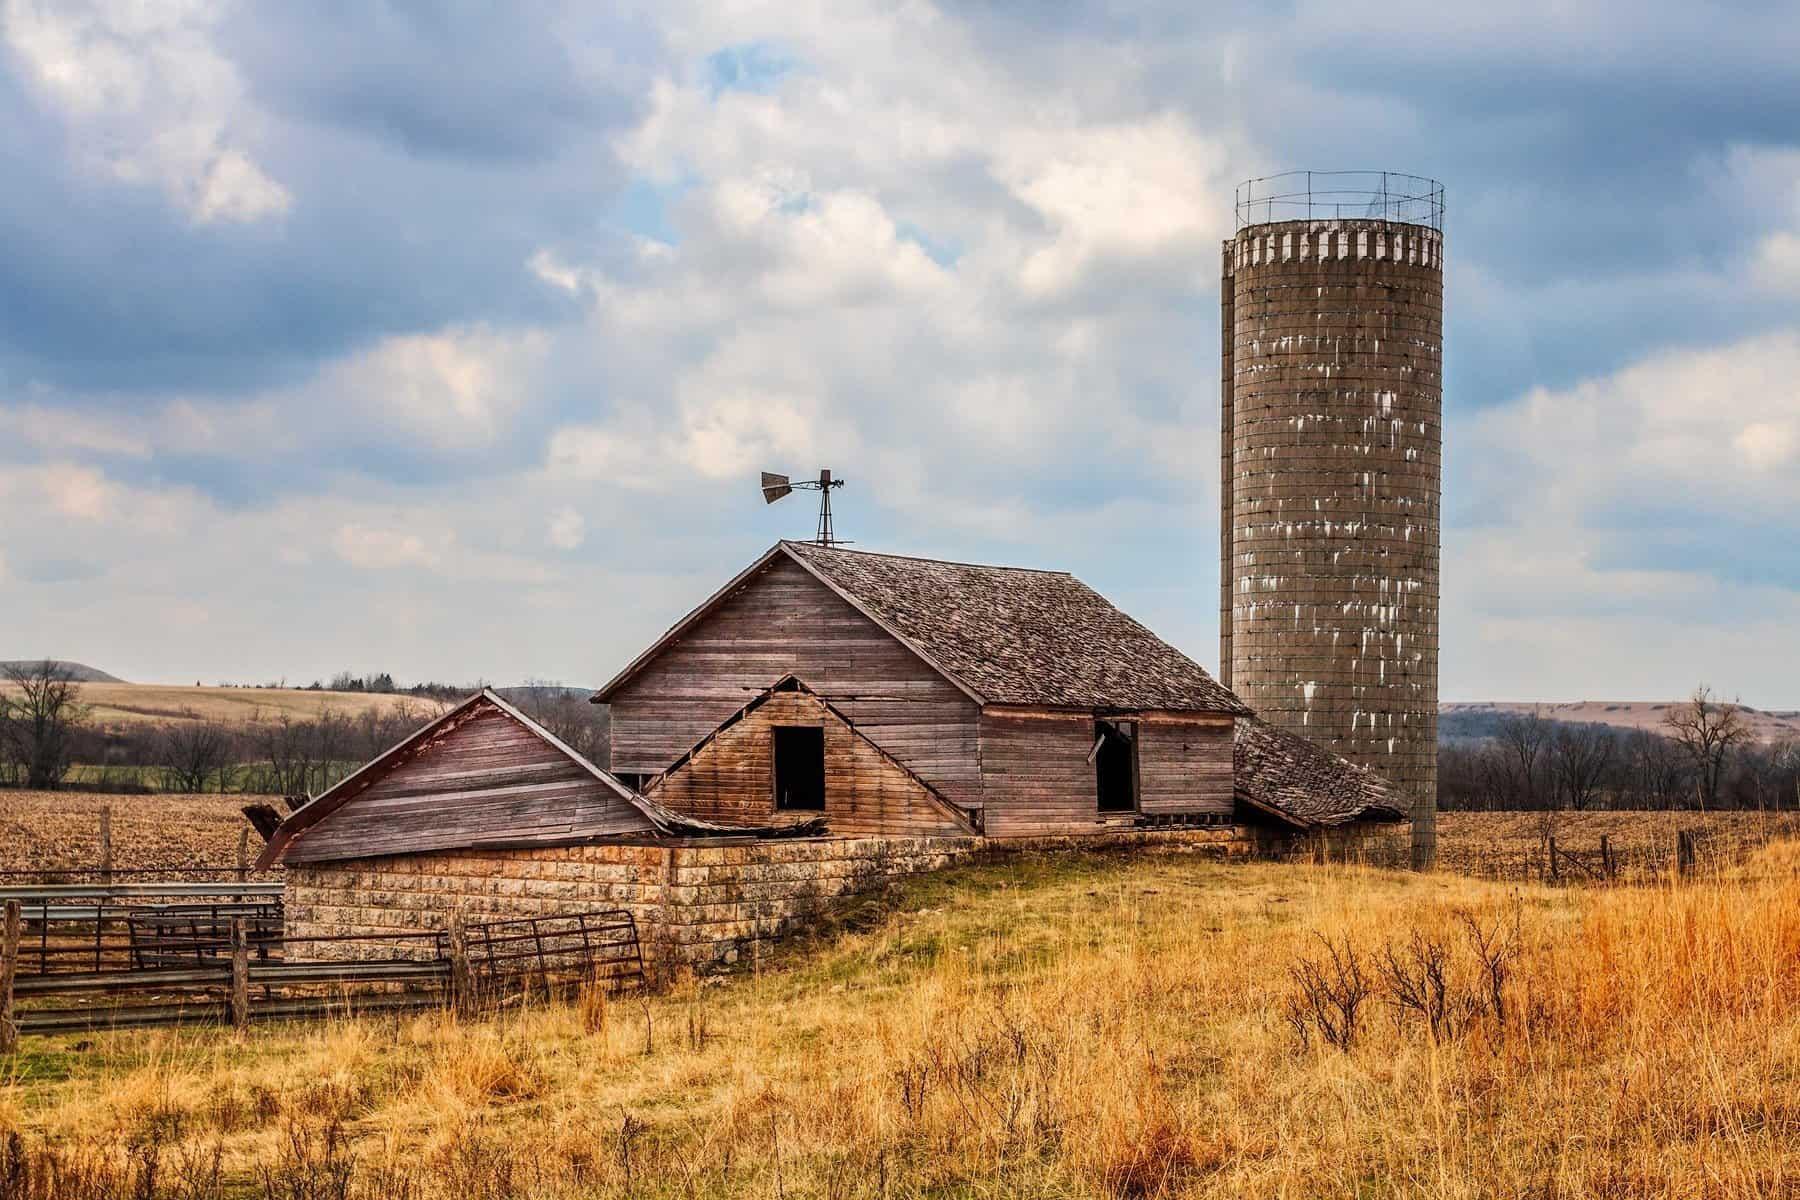 Old barn and silo photo